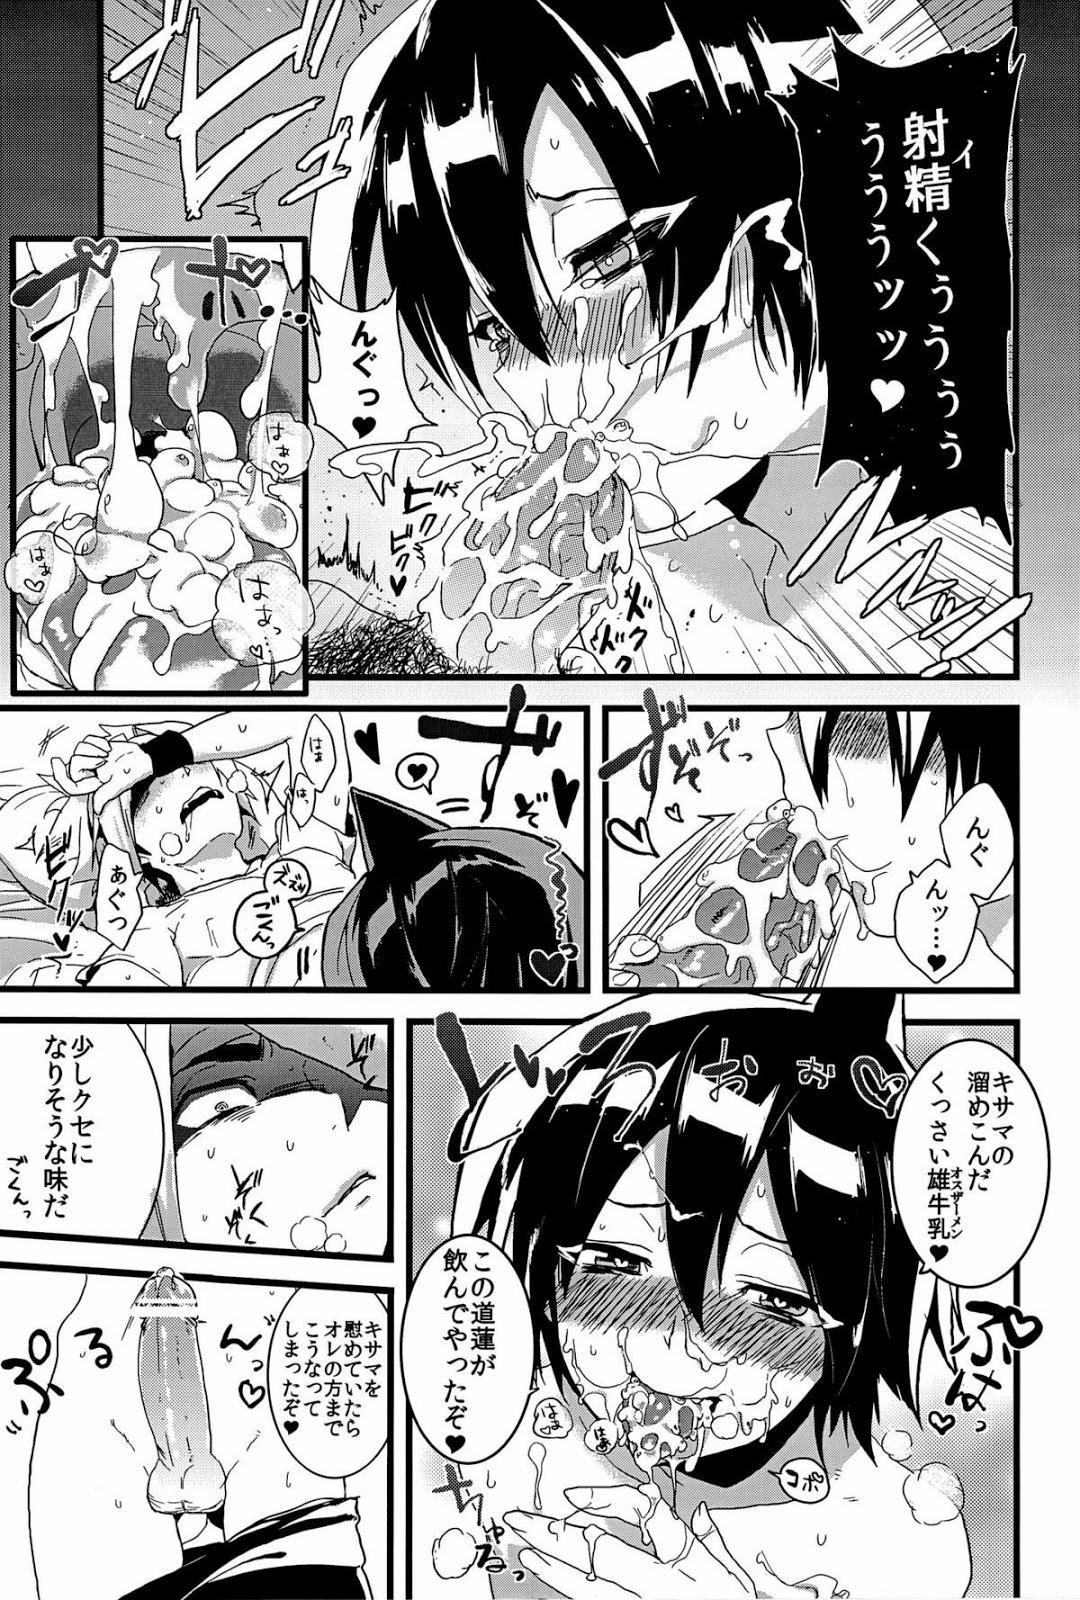 Kisama no Hajimete Ore no Mono! 6